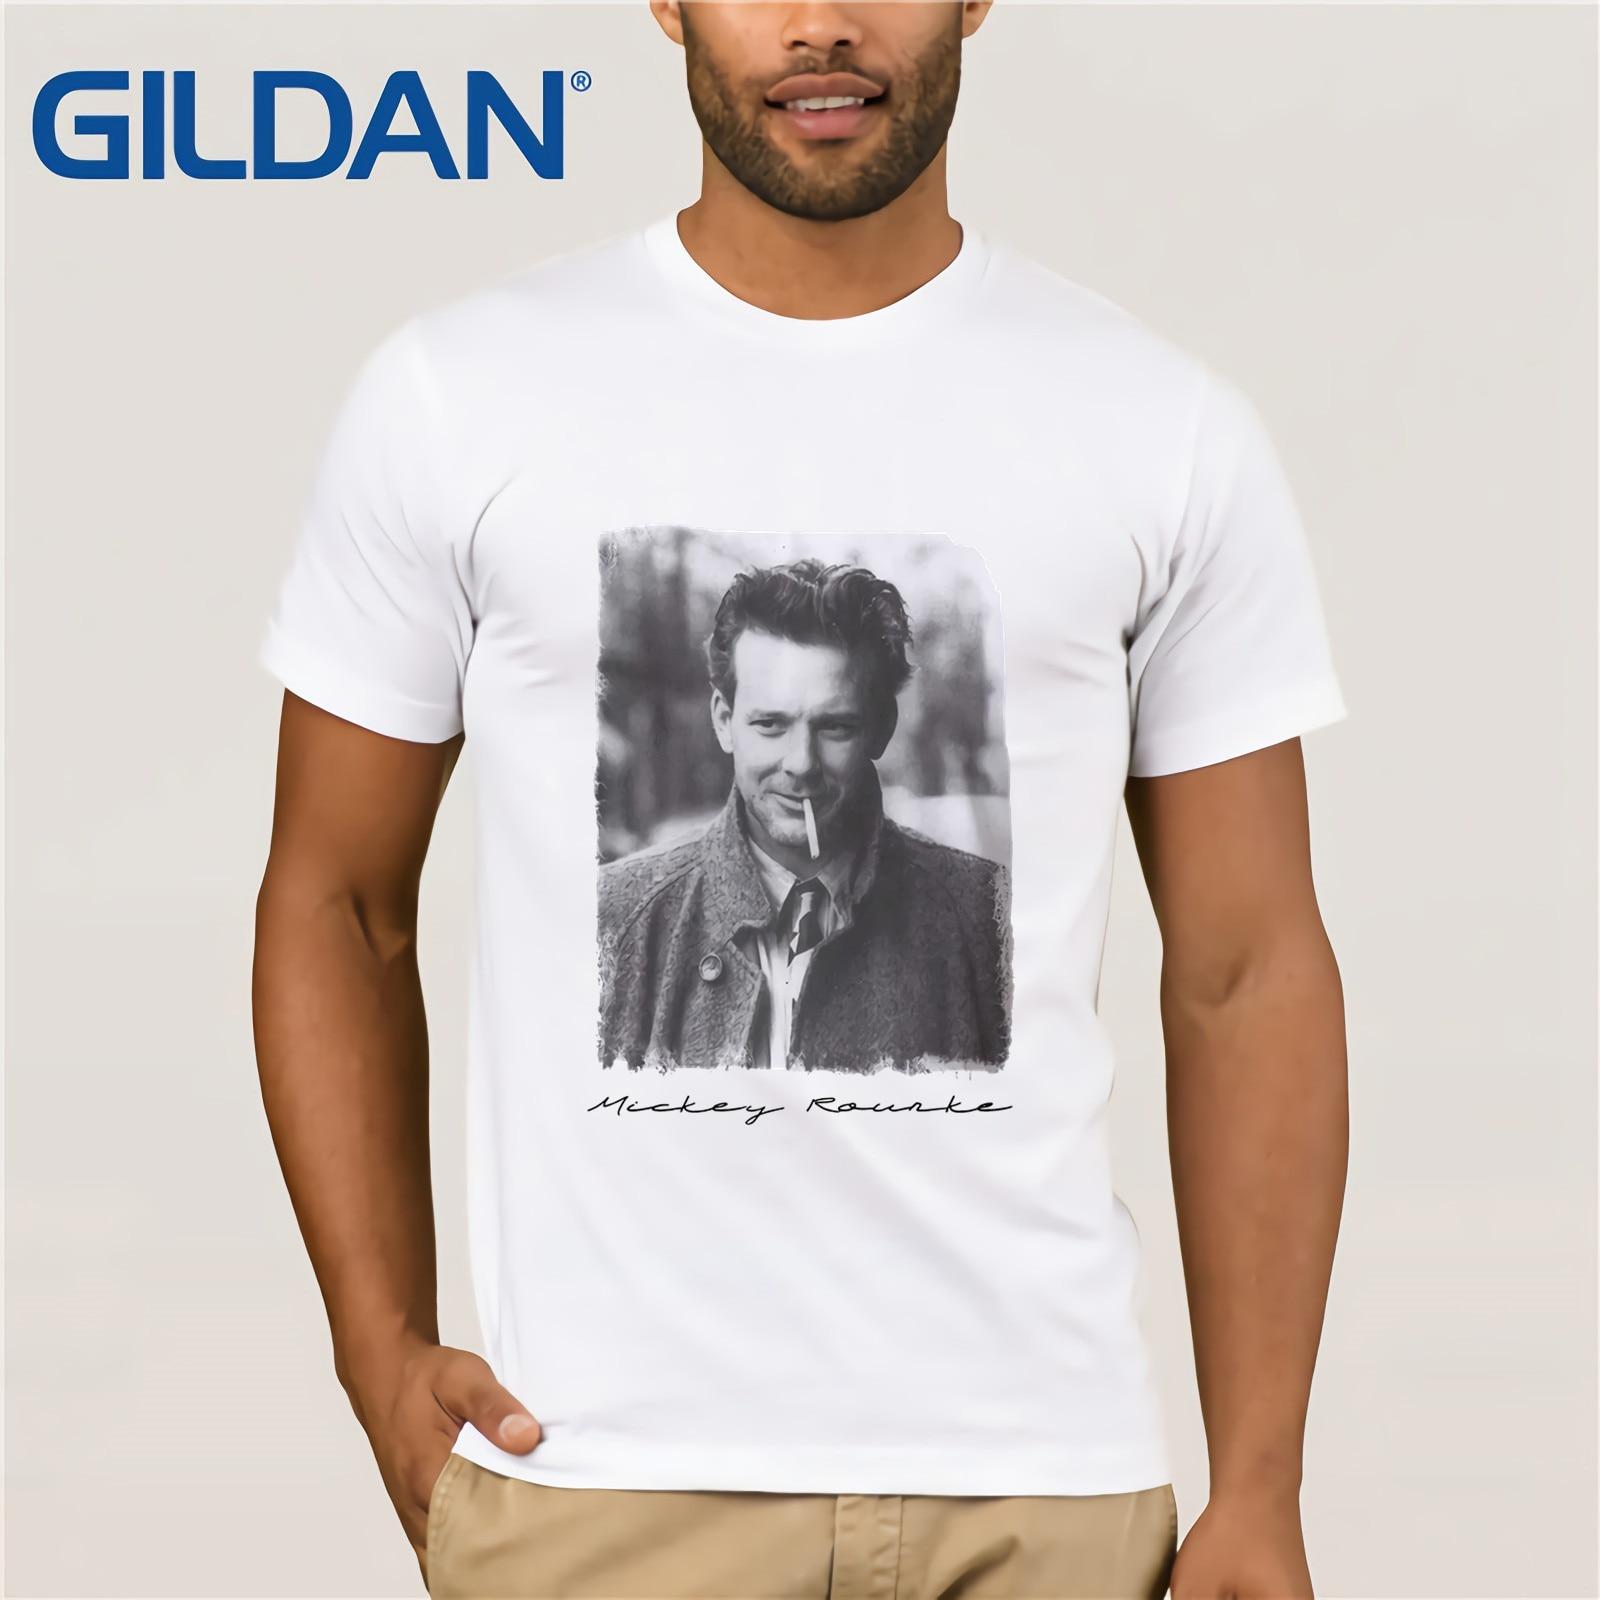 T-shirt Mickey Rourke, t-shirt Blanc pour Hommes, t-shirt Blanc pour Hommes, t-shirt Cadeau